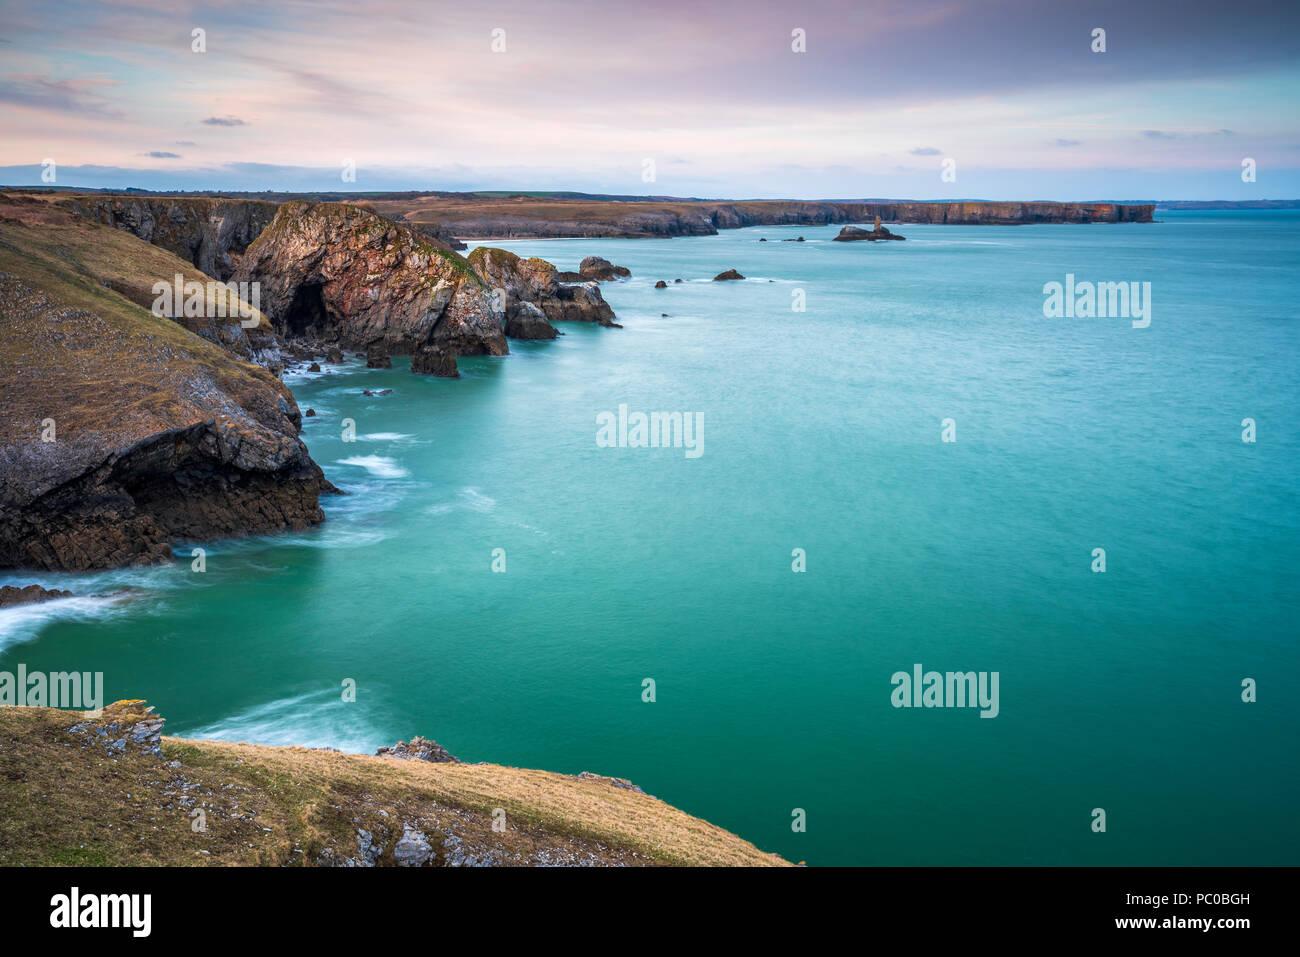 Broad Haven seen from St Govan's Head, Pembrokeshire Coast National Park, Bosherston, Wales, UK - Stock Image